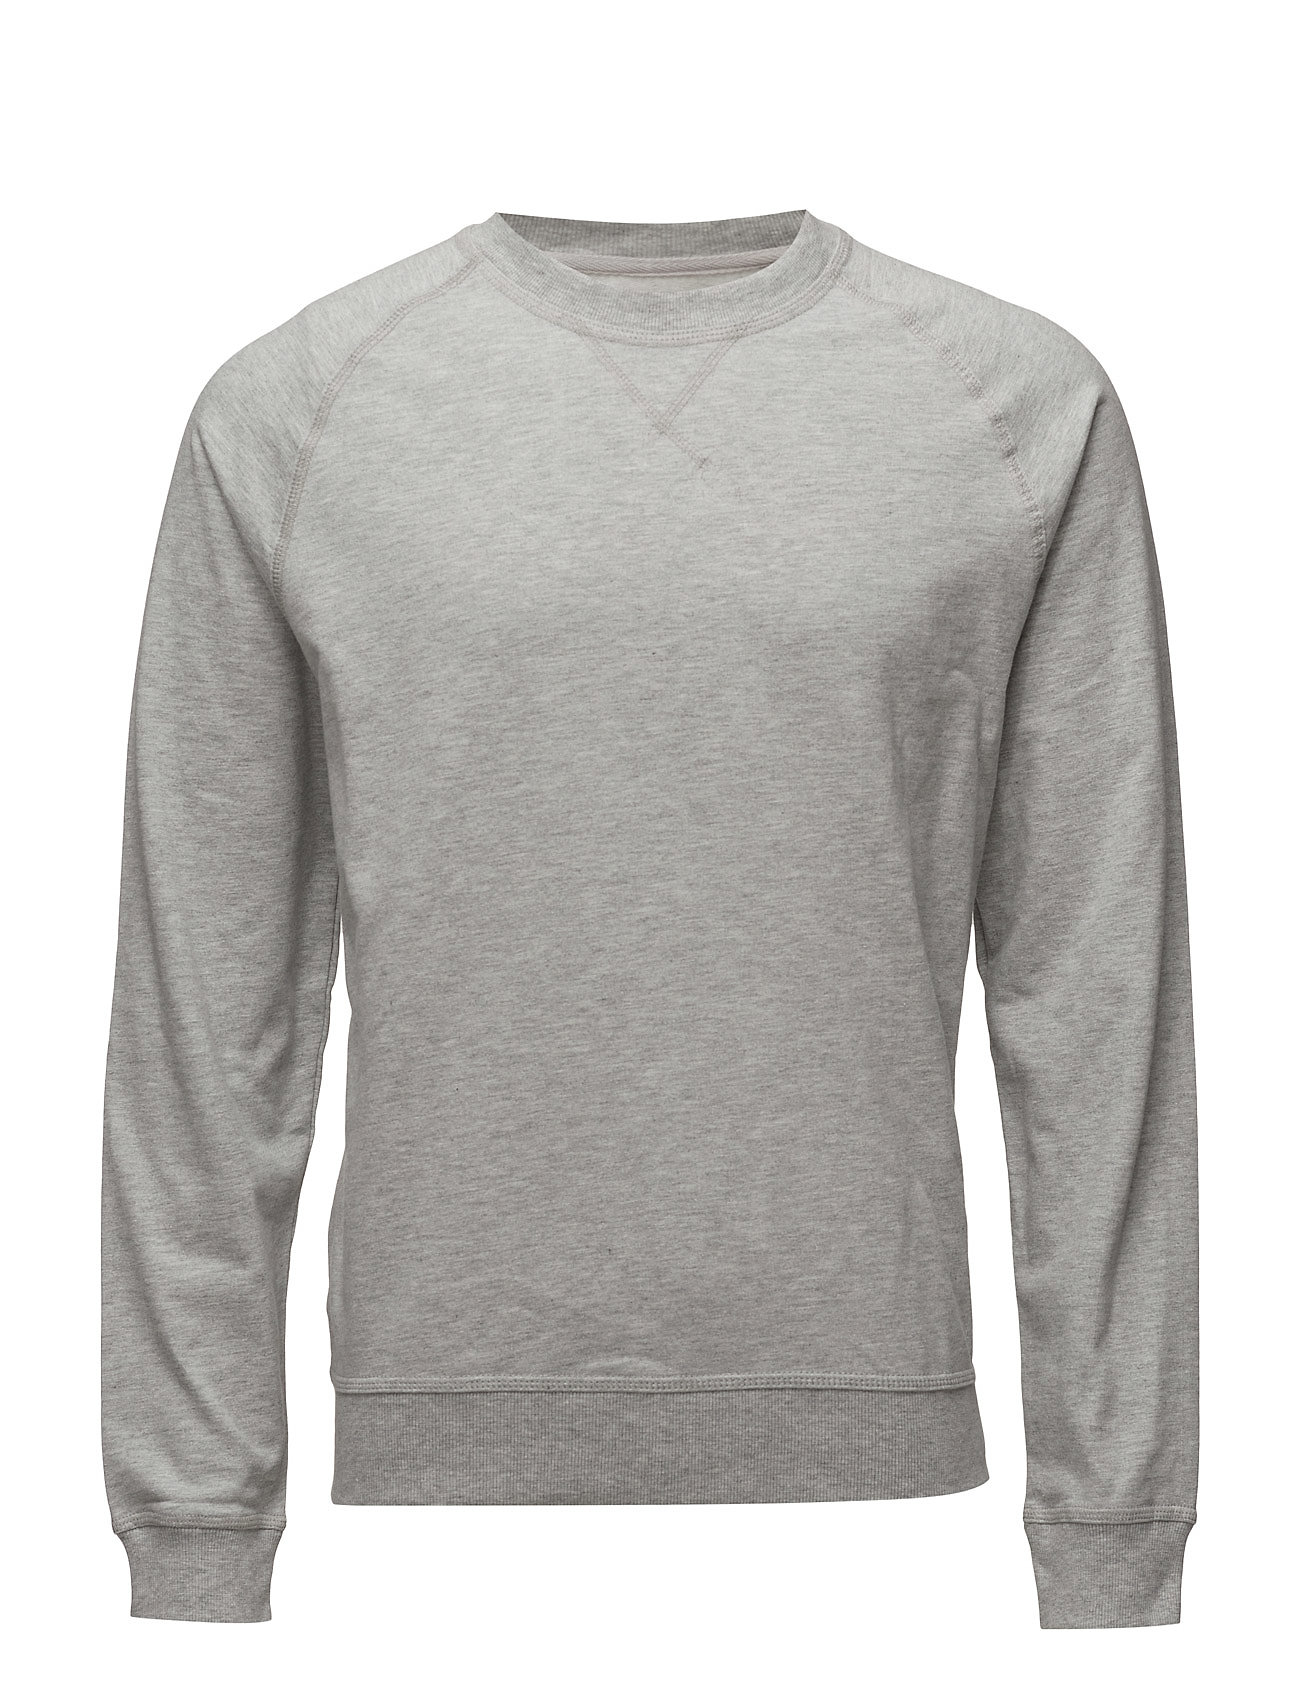 Resteröds Sweatshirt - GREY MEL.